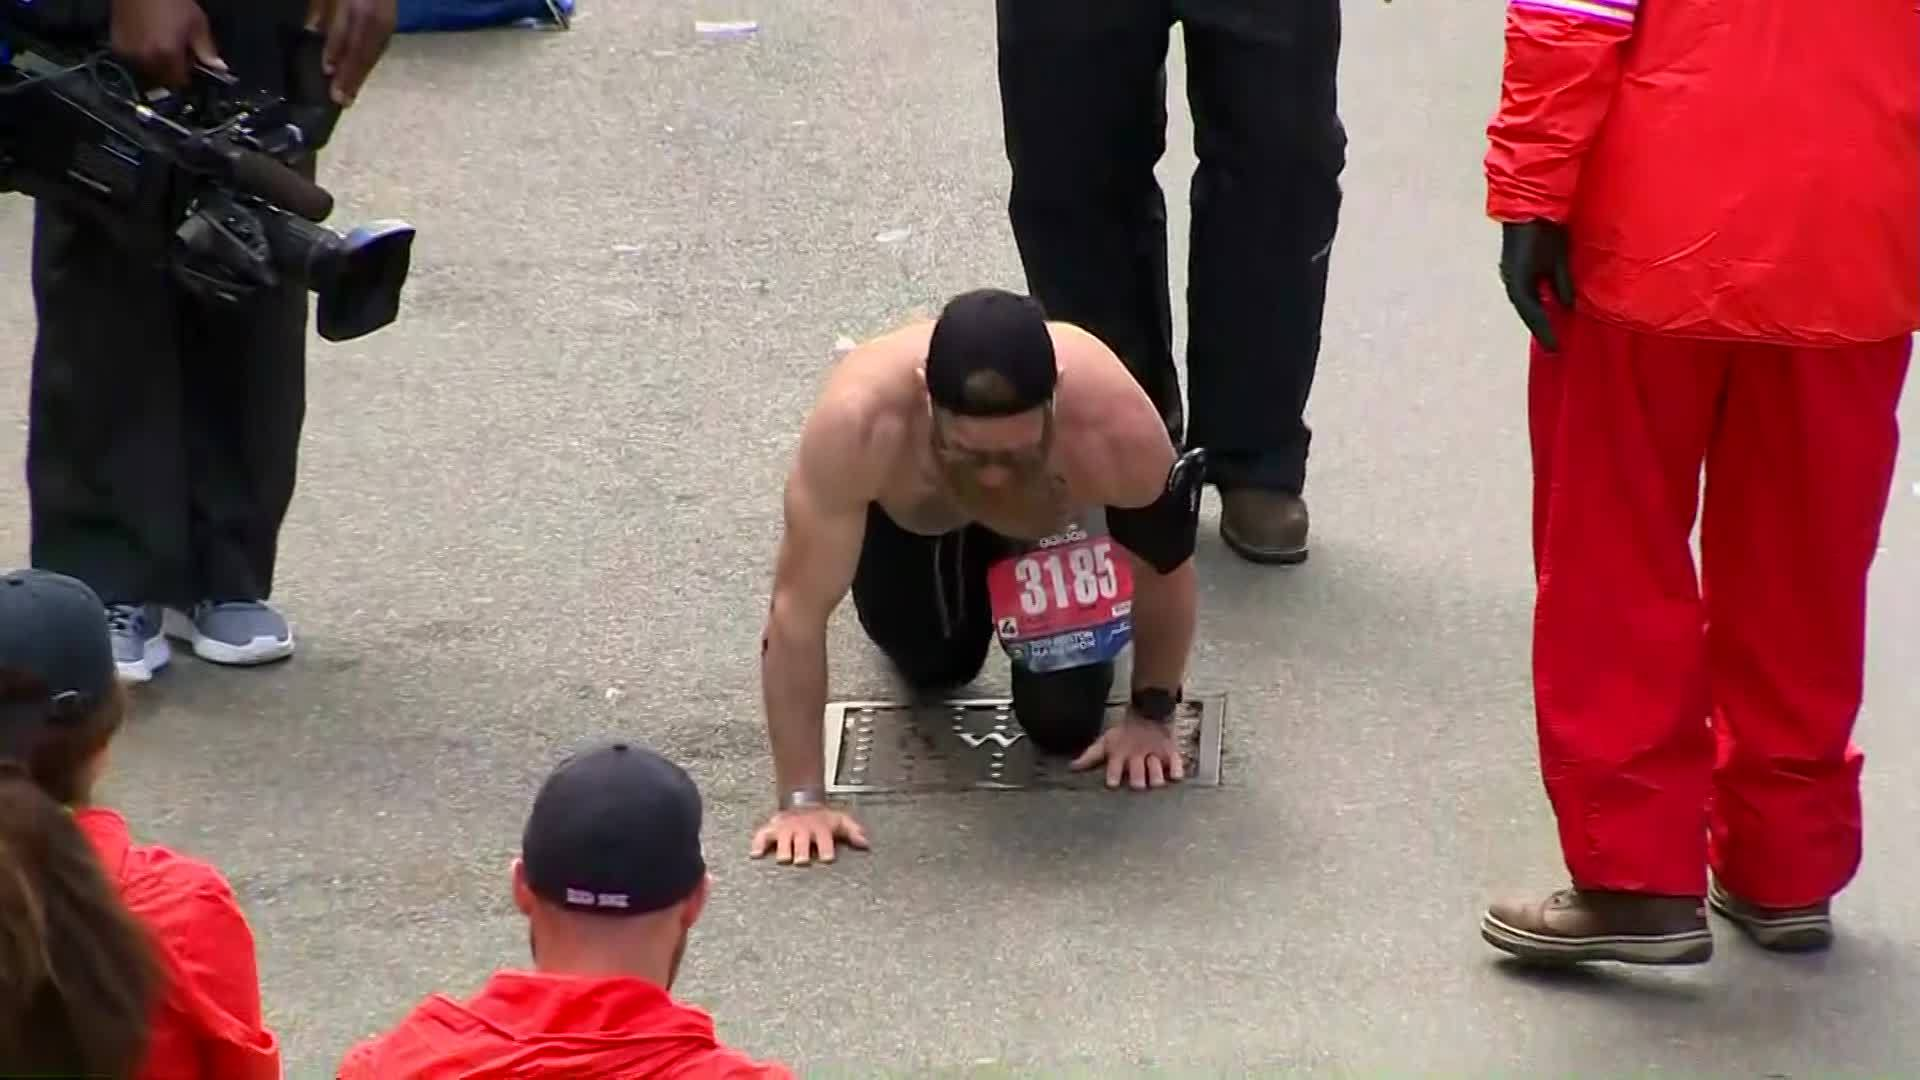 U_S__Marine_crosses_Boston_Marathon_fini_0_20190416130929